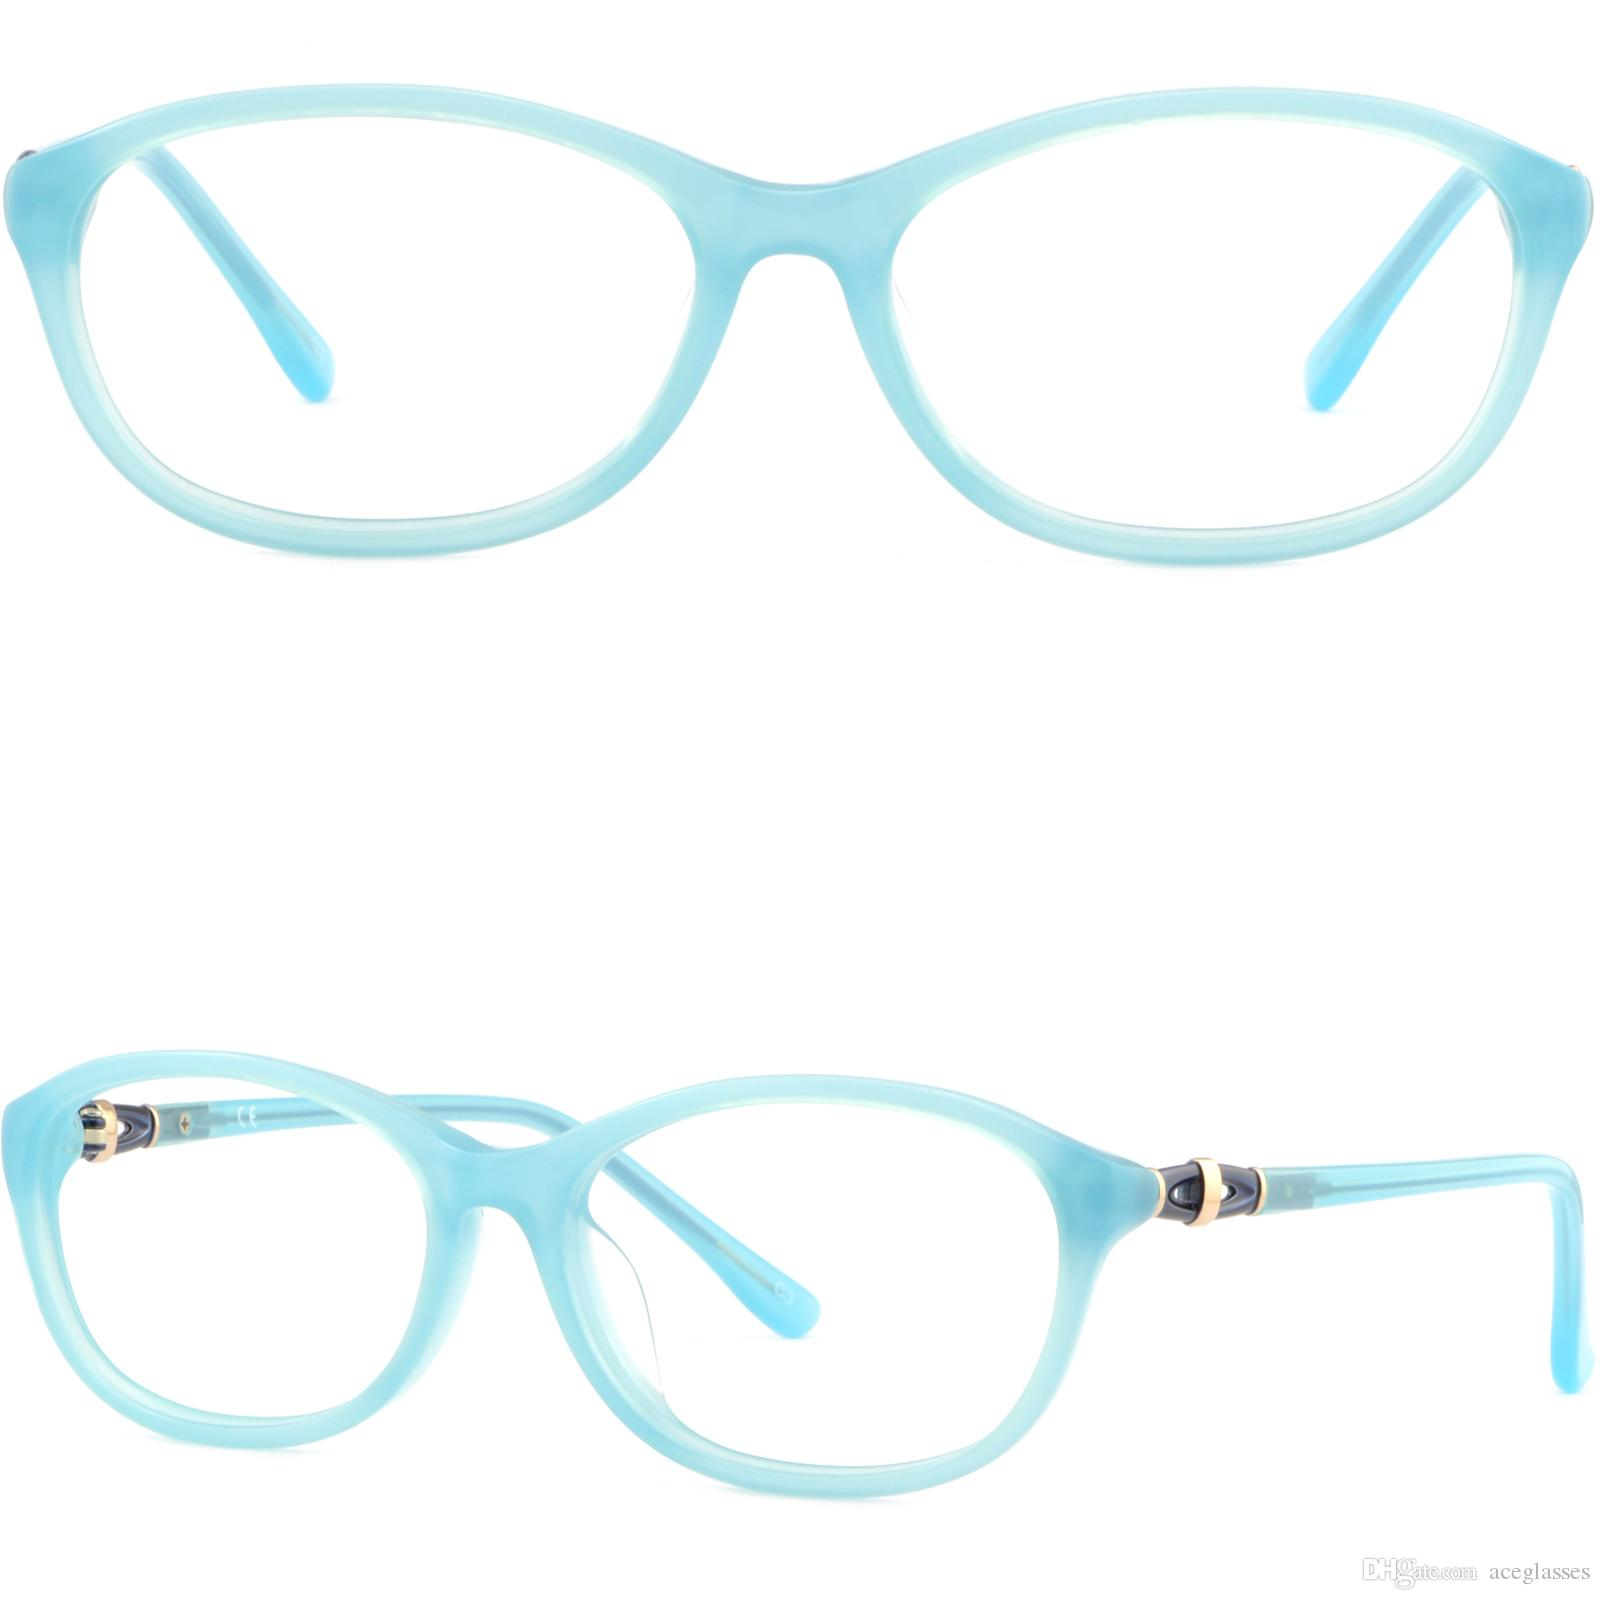 c8732a2549a Blue Womens Frames Thin Light Acetate Prescription Glasses Oval Eyeglasses  Brille Fassung Gestel Frames Eyeglasses Glasses Frames Styles From  Aceglasses